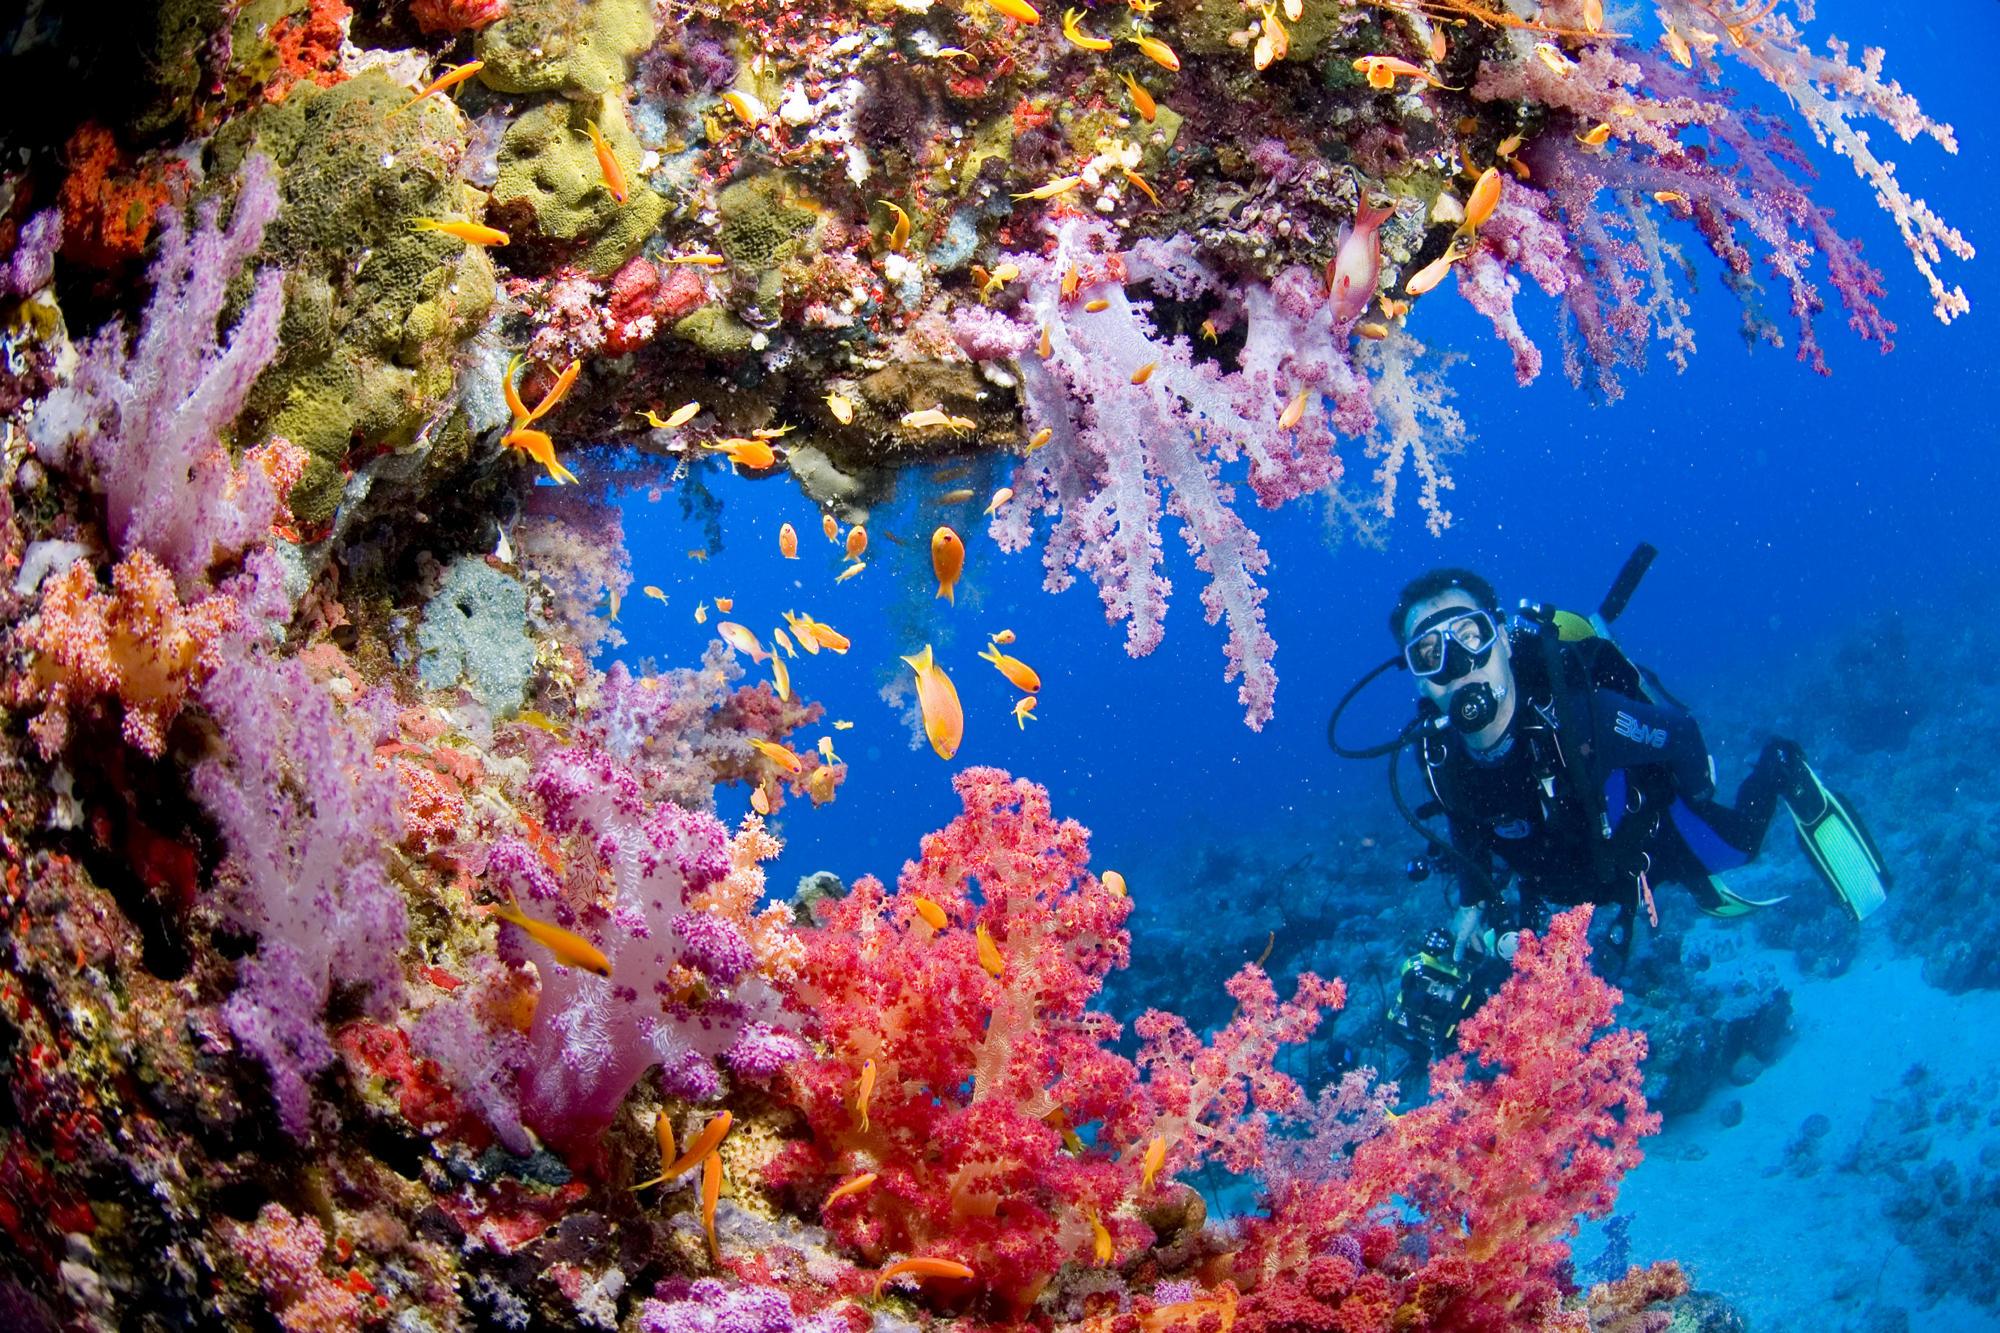 Sports scuba diving ocean sea underwater coral reef people wallpaper 2000x1333